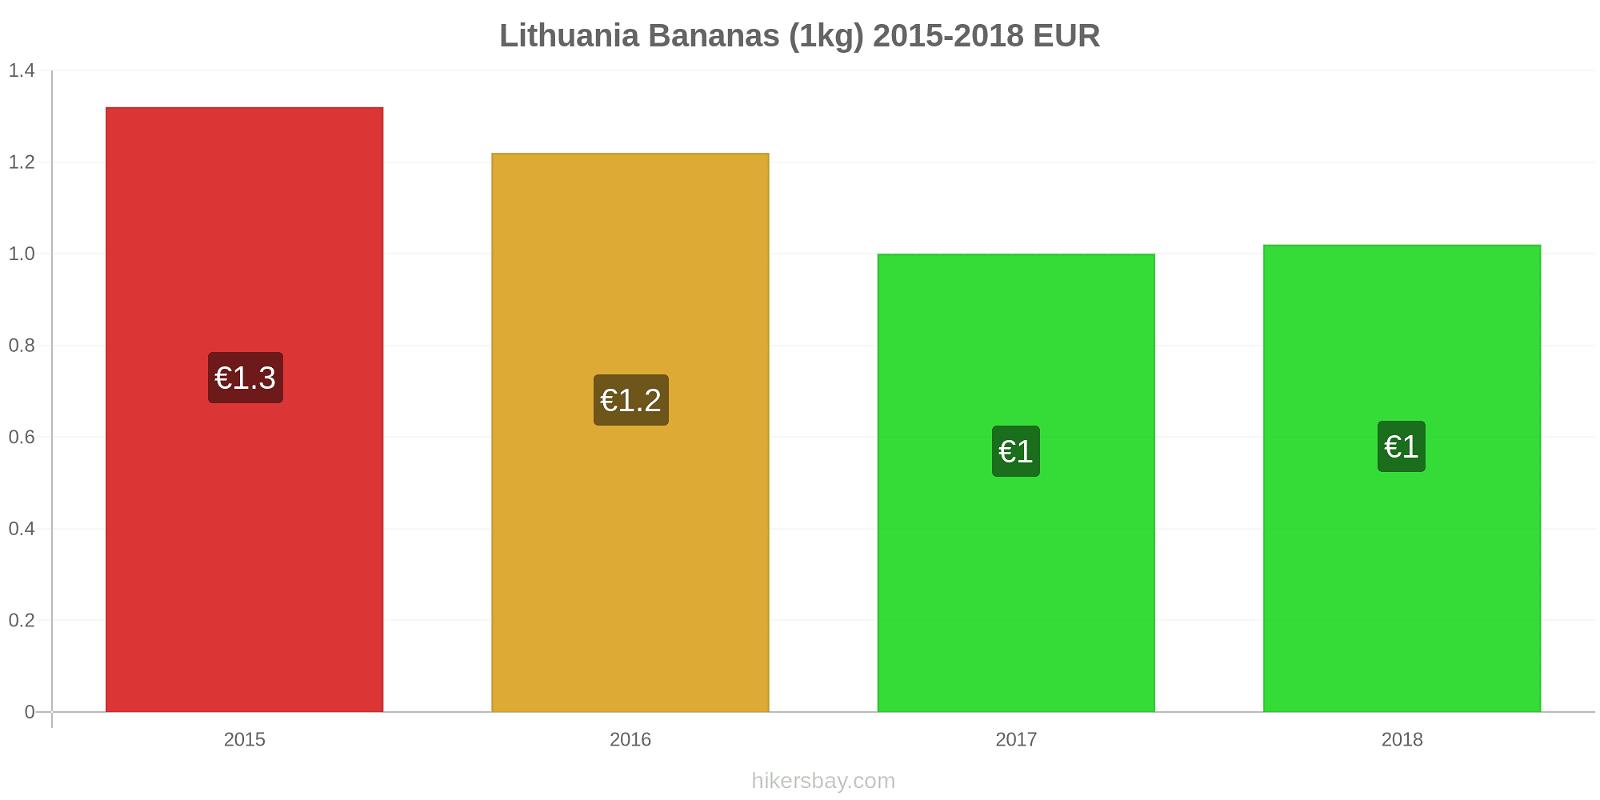 Lithuania price changes Bananas (1kg) hikersbay.com